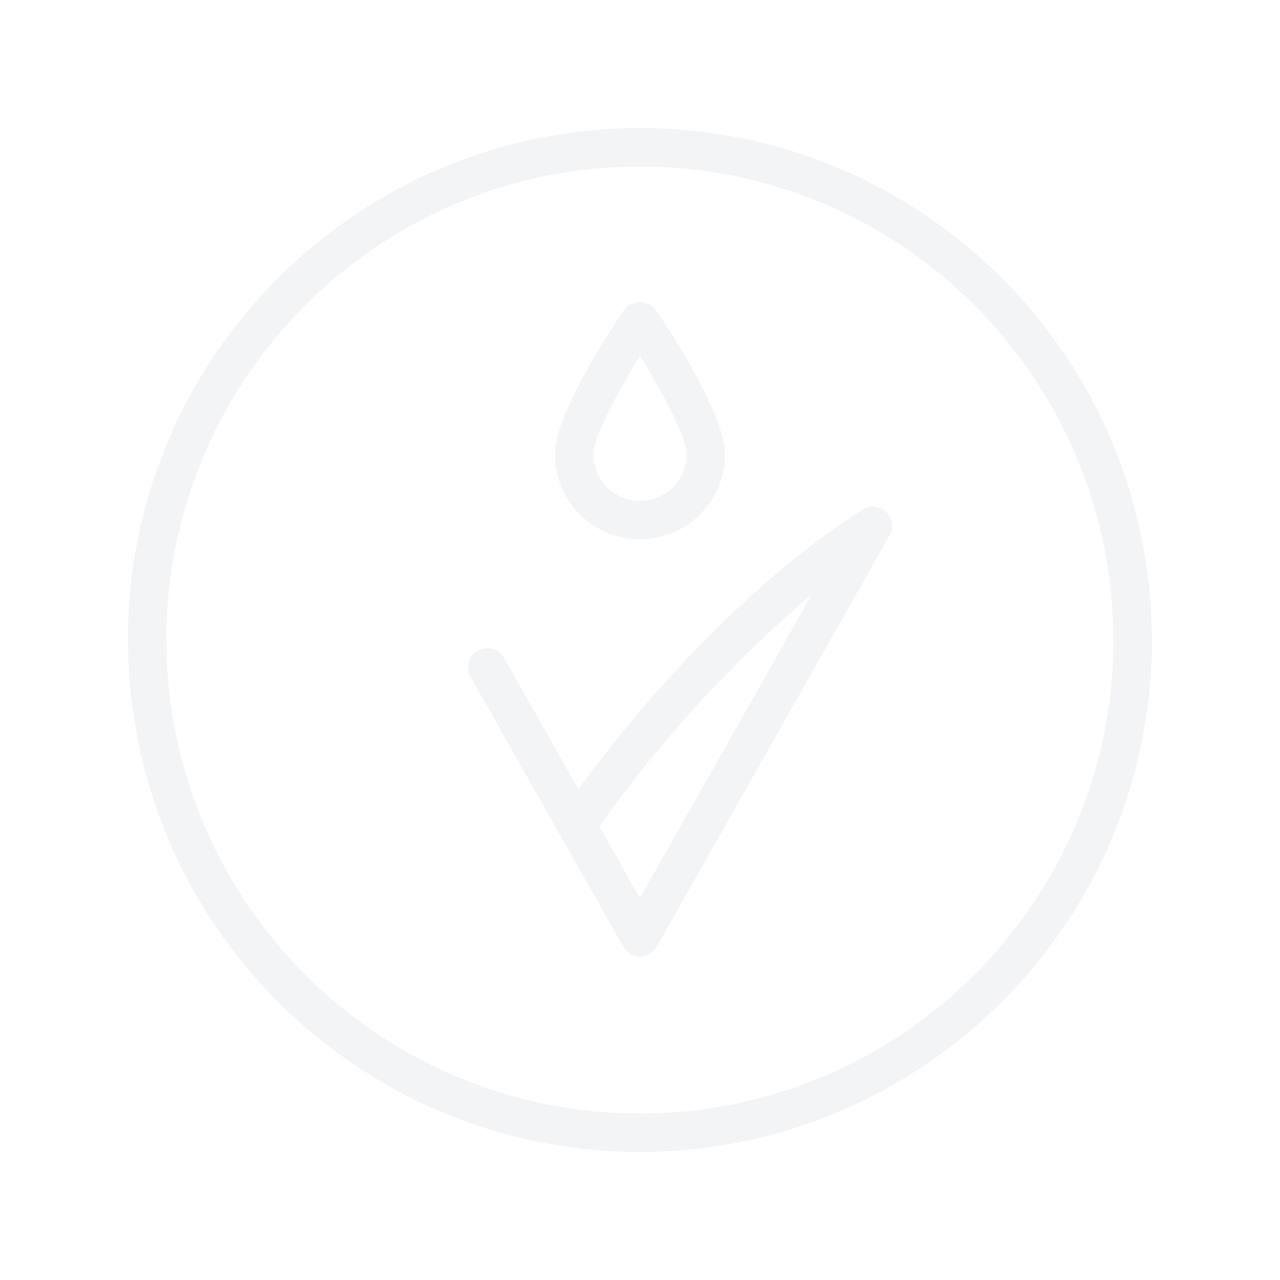 MAYBELLINE Tattoo Liner Gel Pencil 1.3g